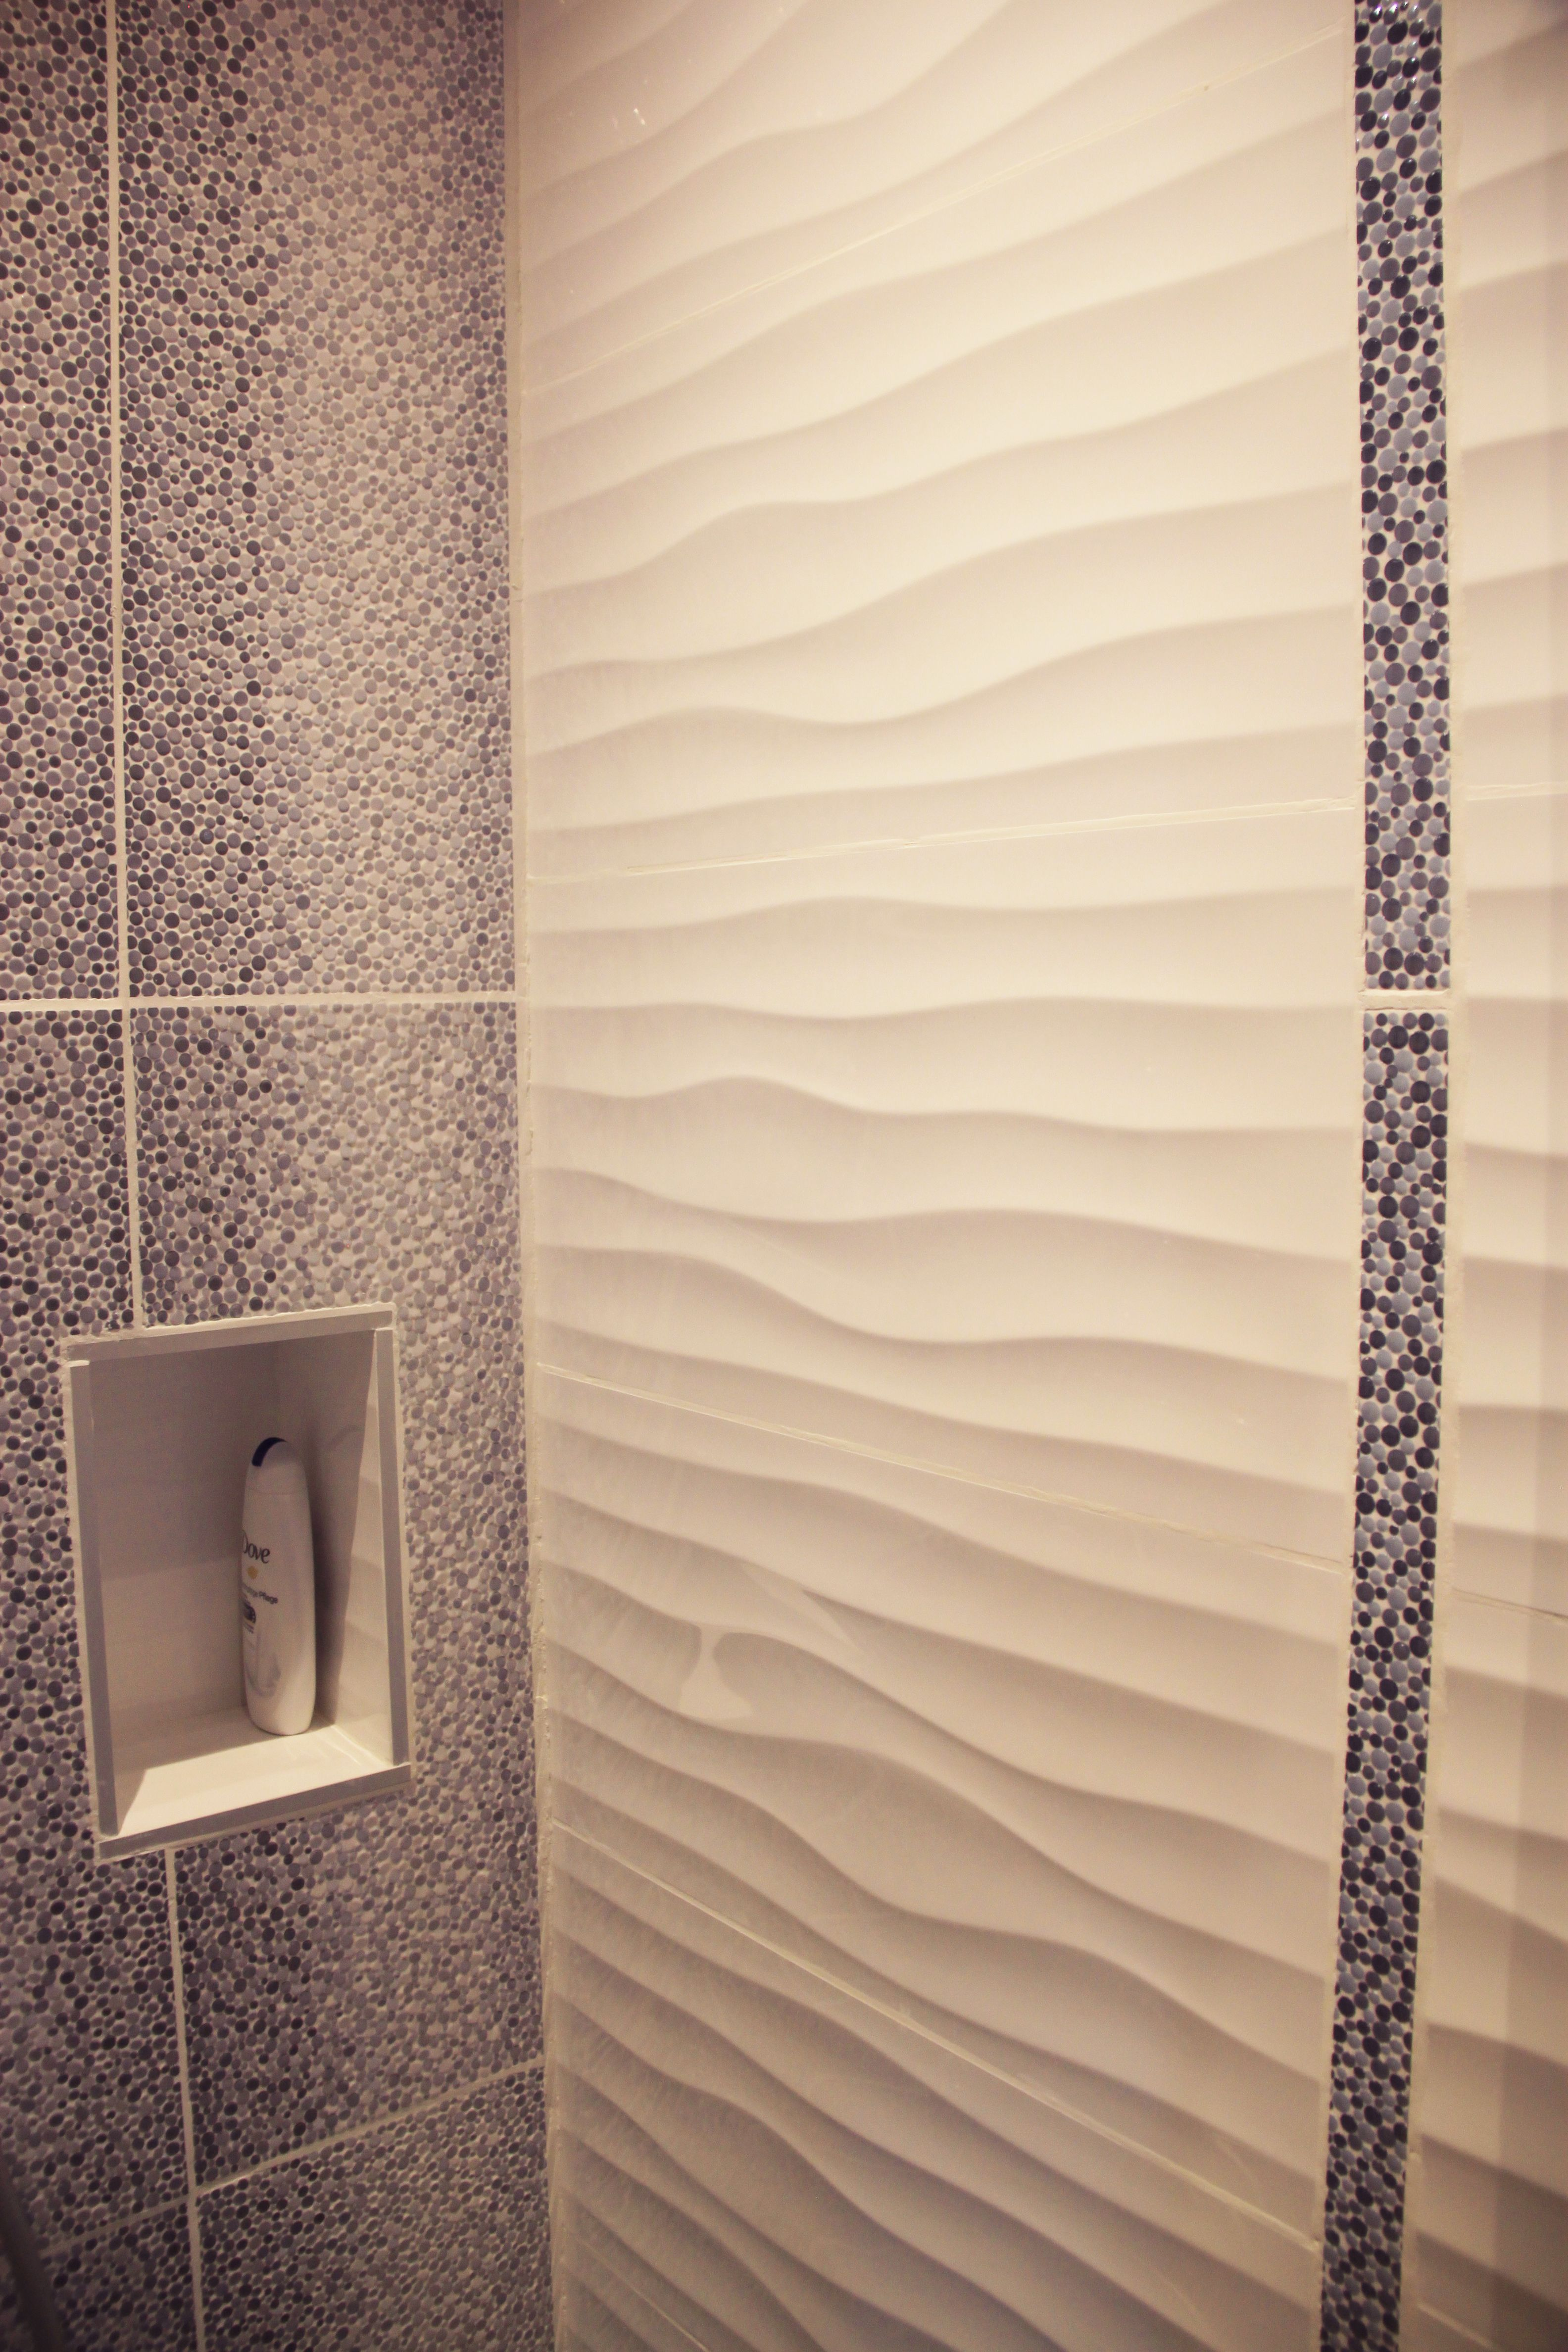 19+ Faience salle de bain vague blanc trends